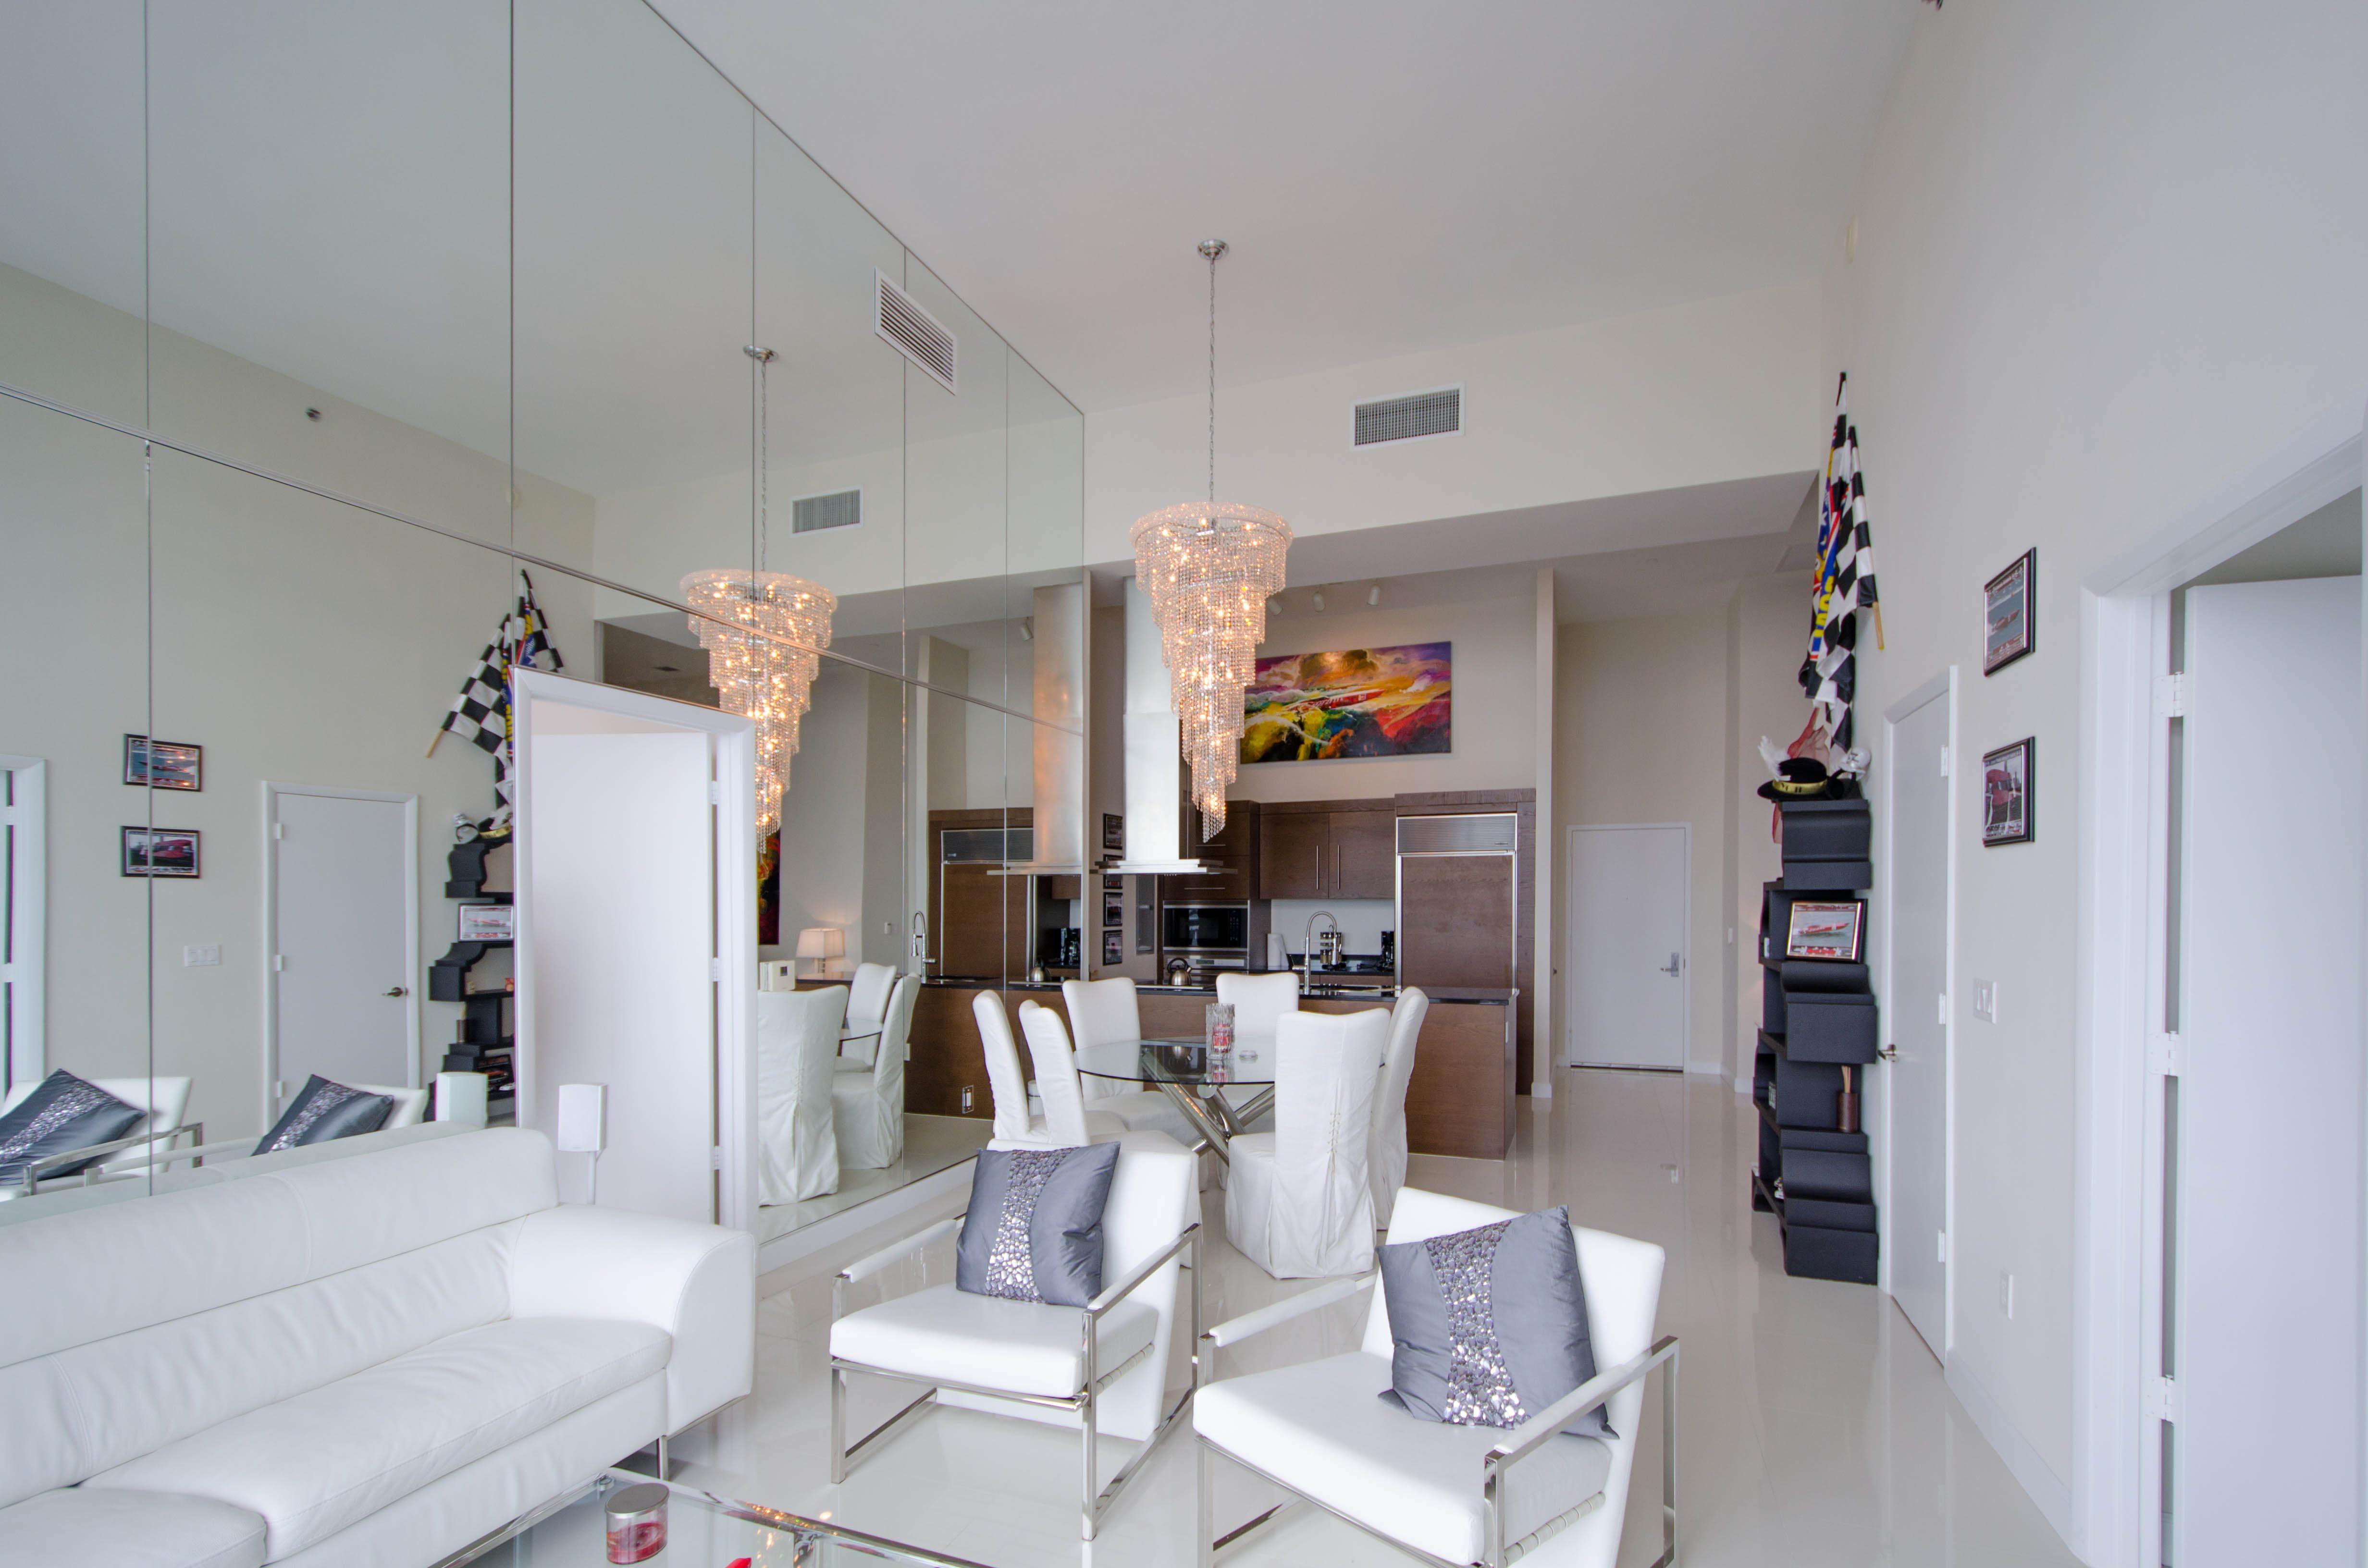 1 Bedroom Apartments For In Miami Fl Com